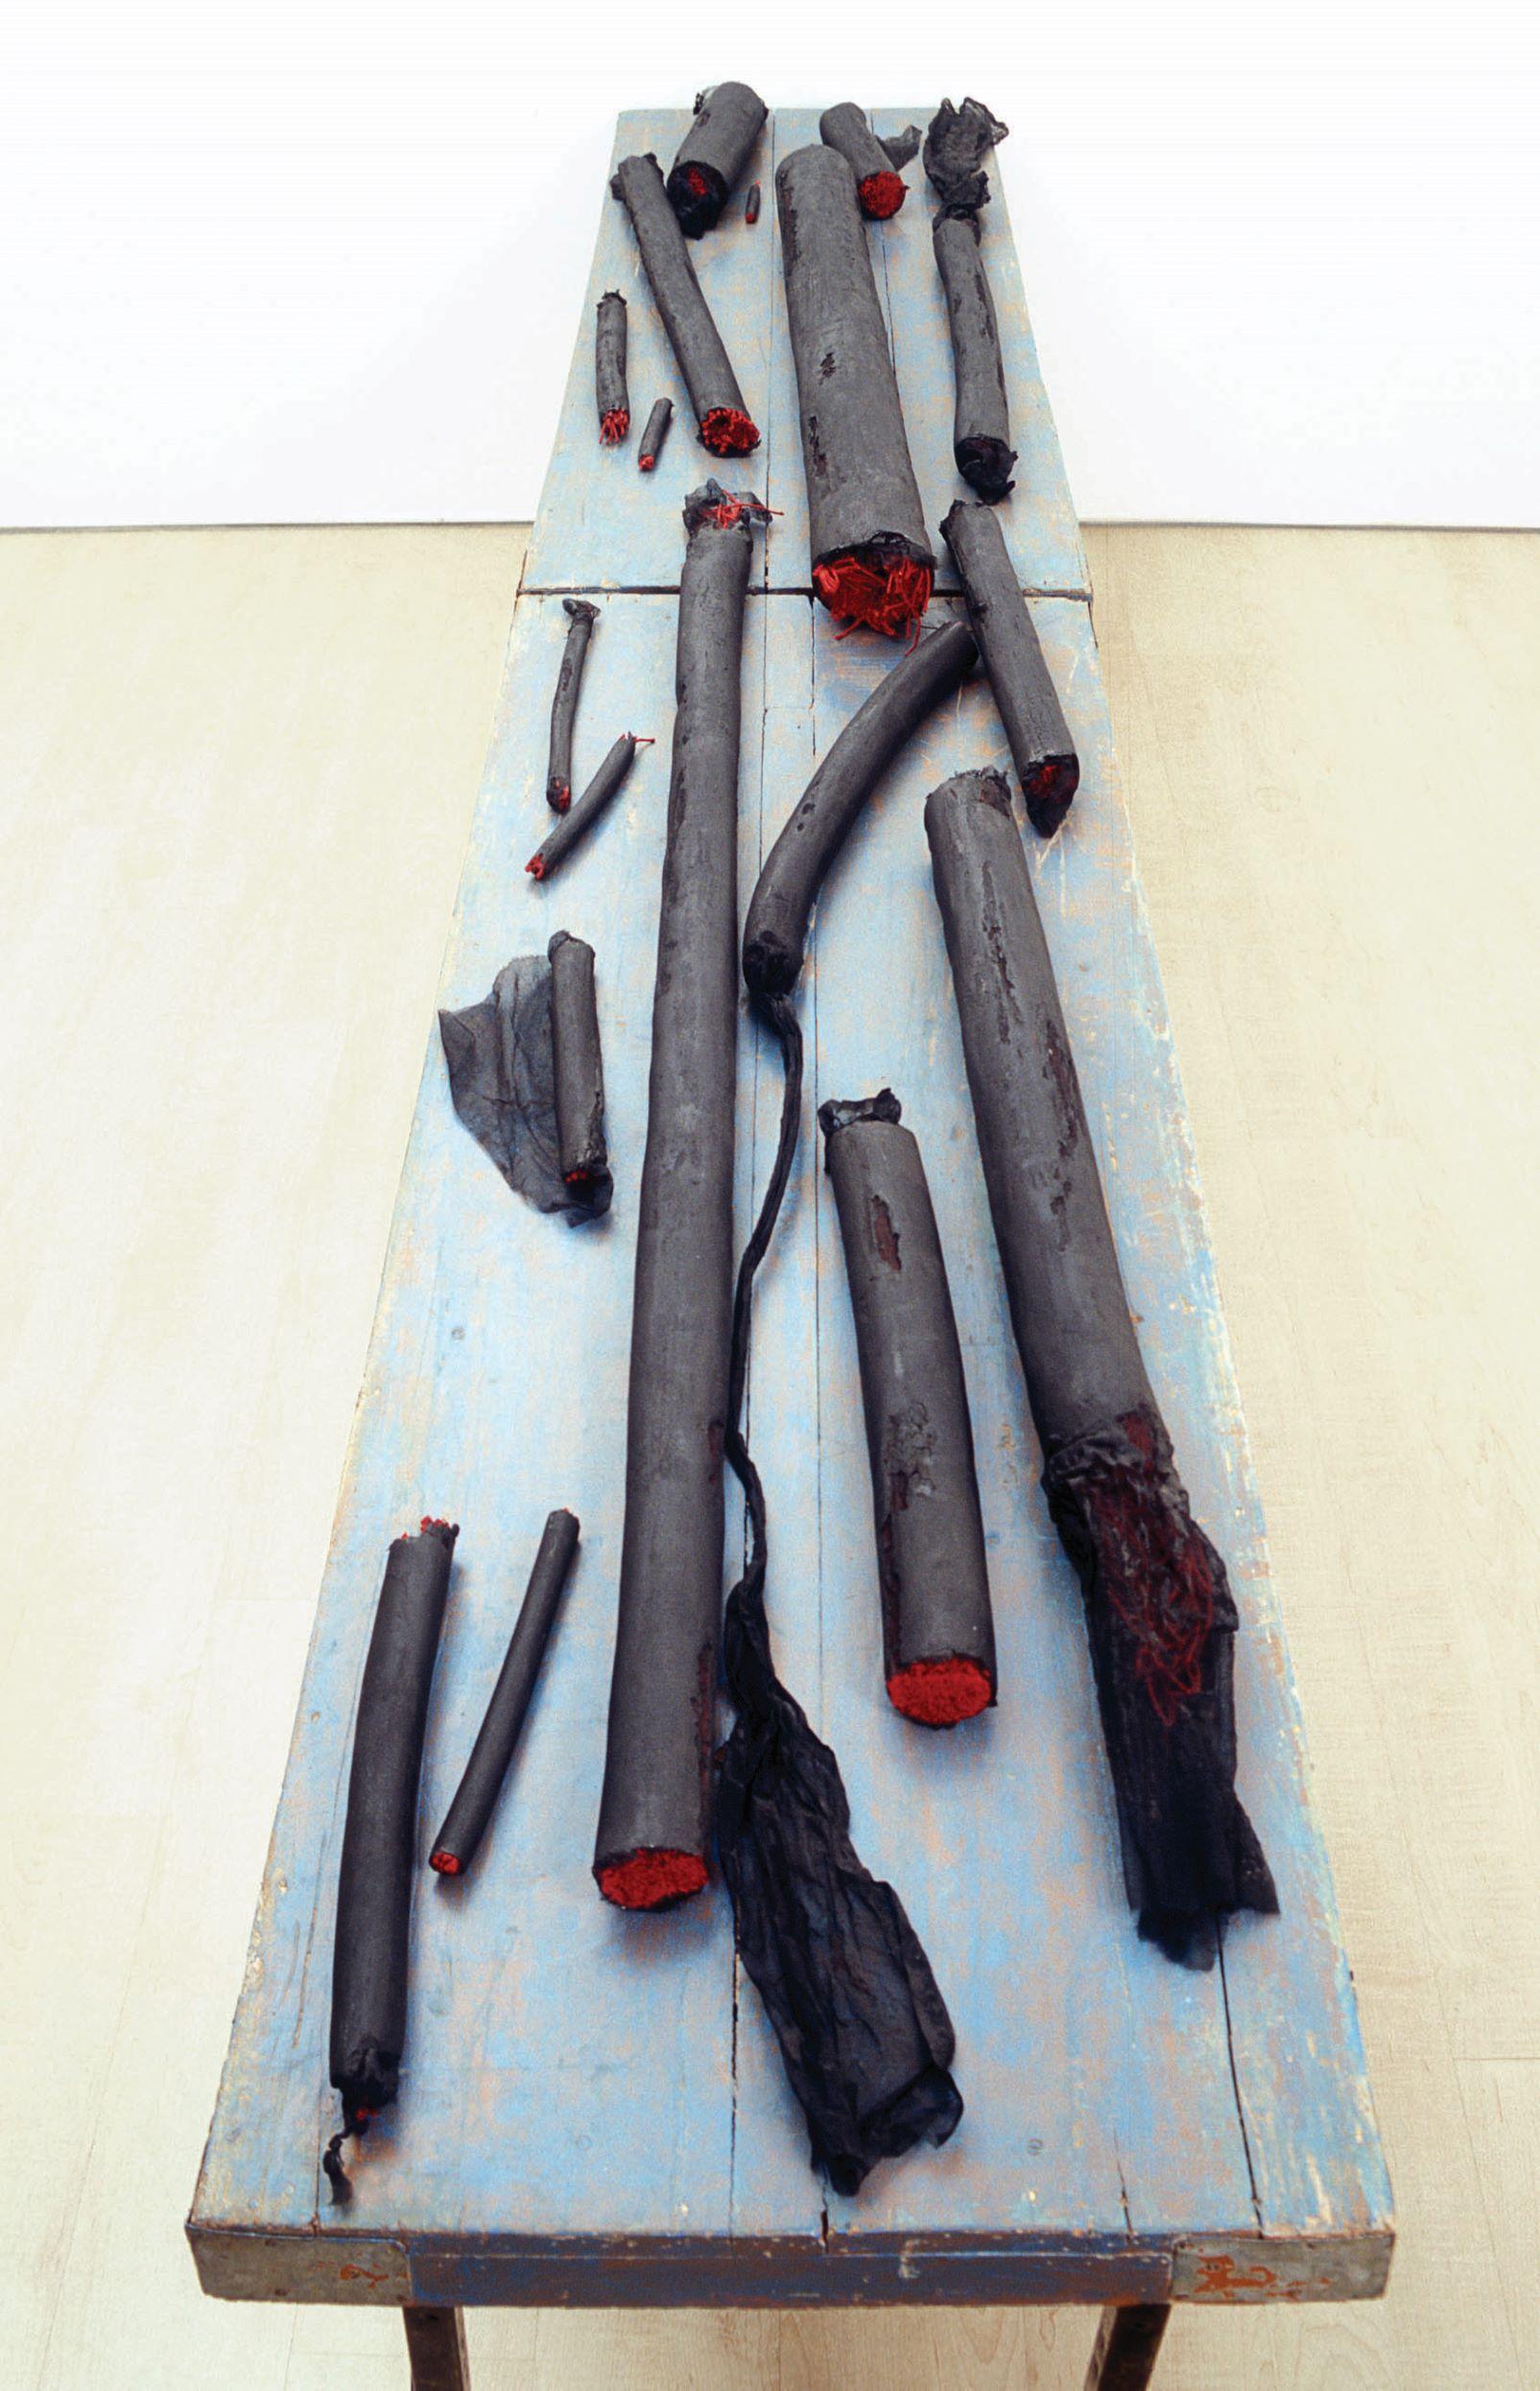 Sheela Gowda; Breaths, 2002 (dettaglio); Collezione Sunitha and Niall Emmart. Courtesy dell'artista